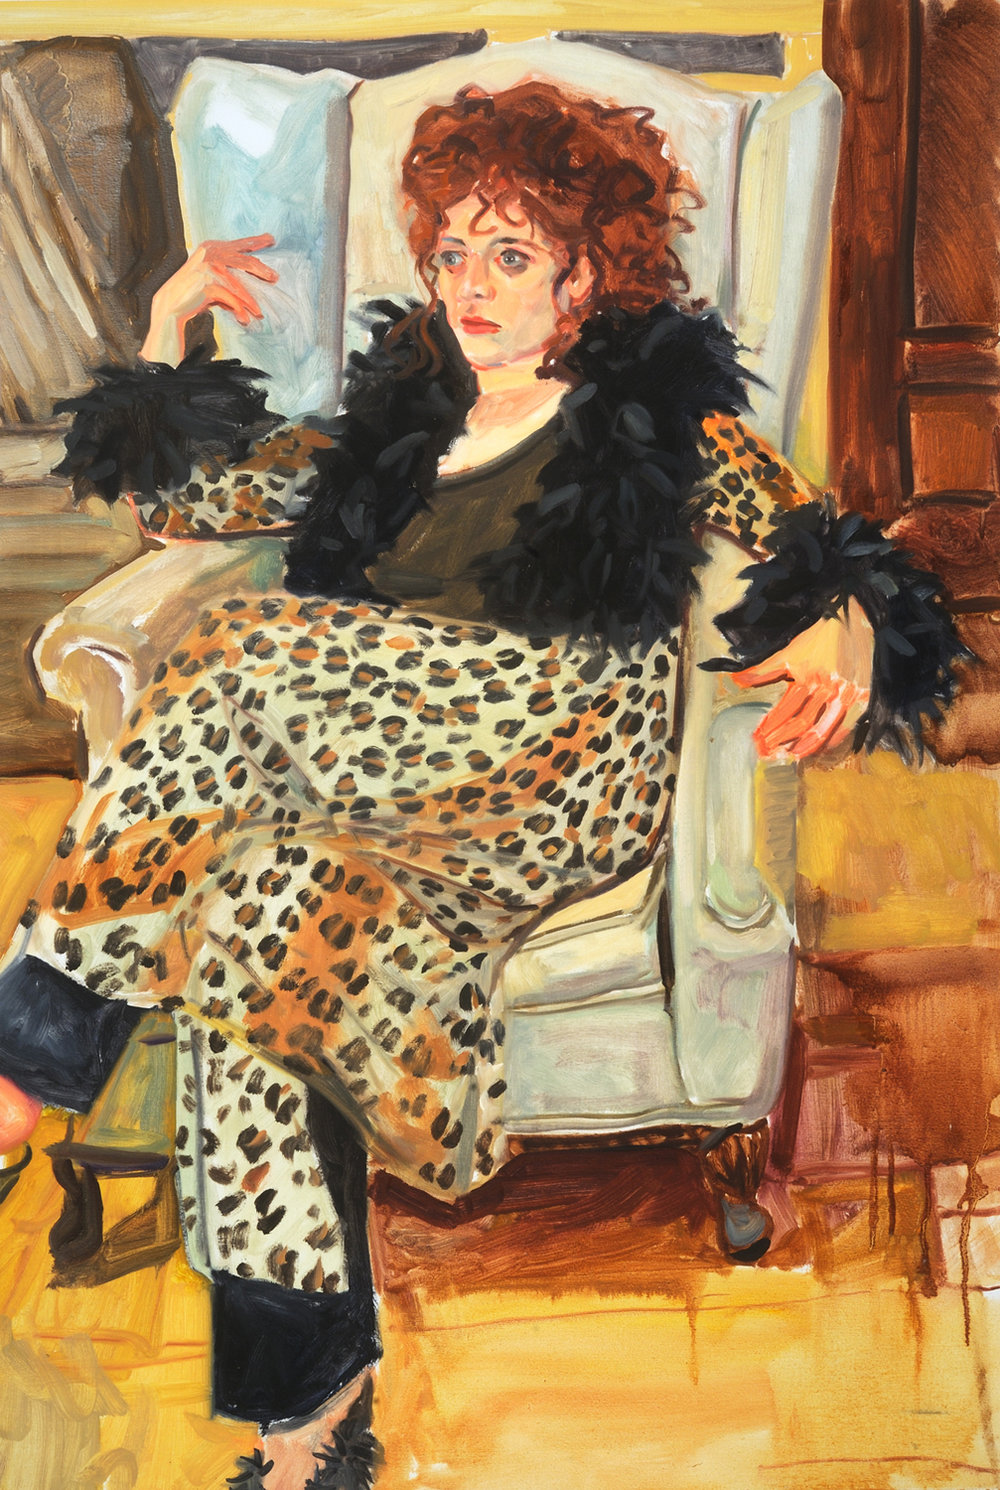 Leopard Skin Dress, 1998